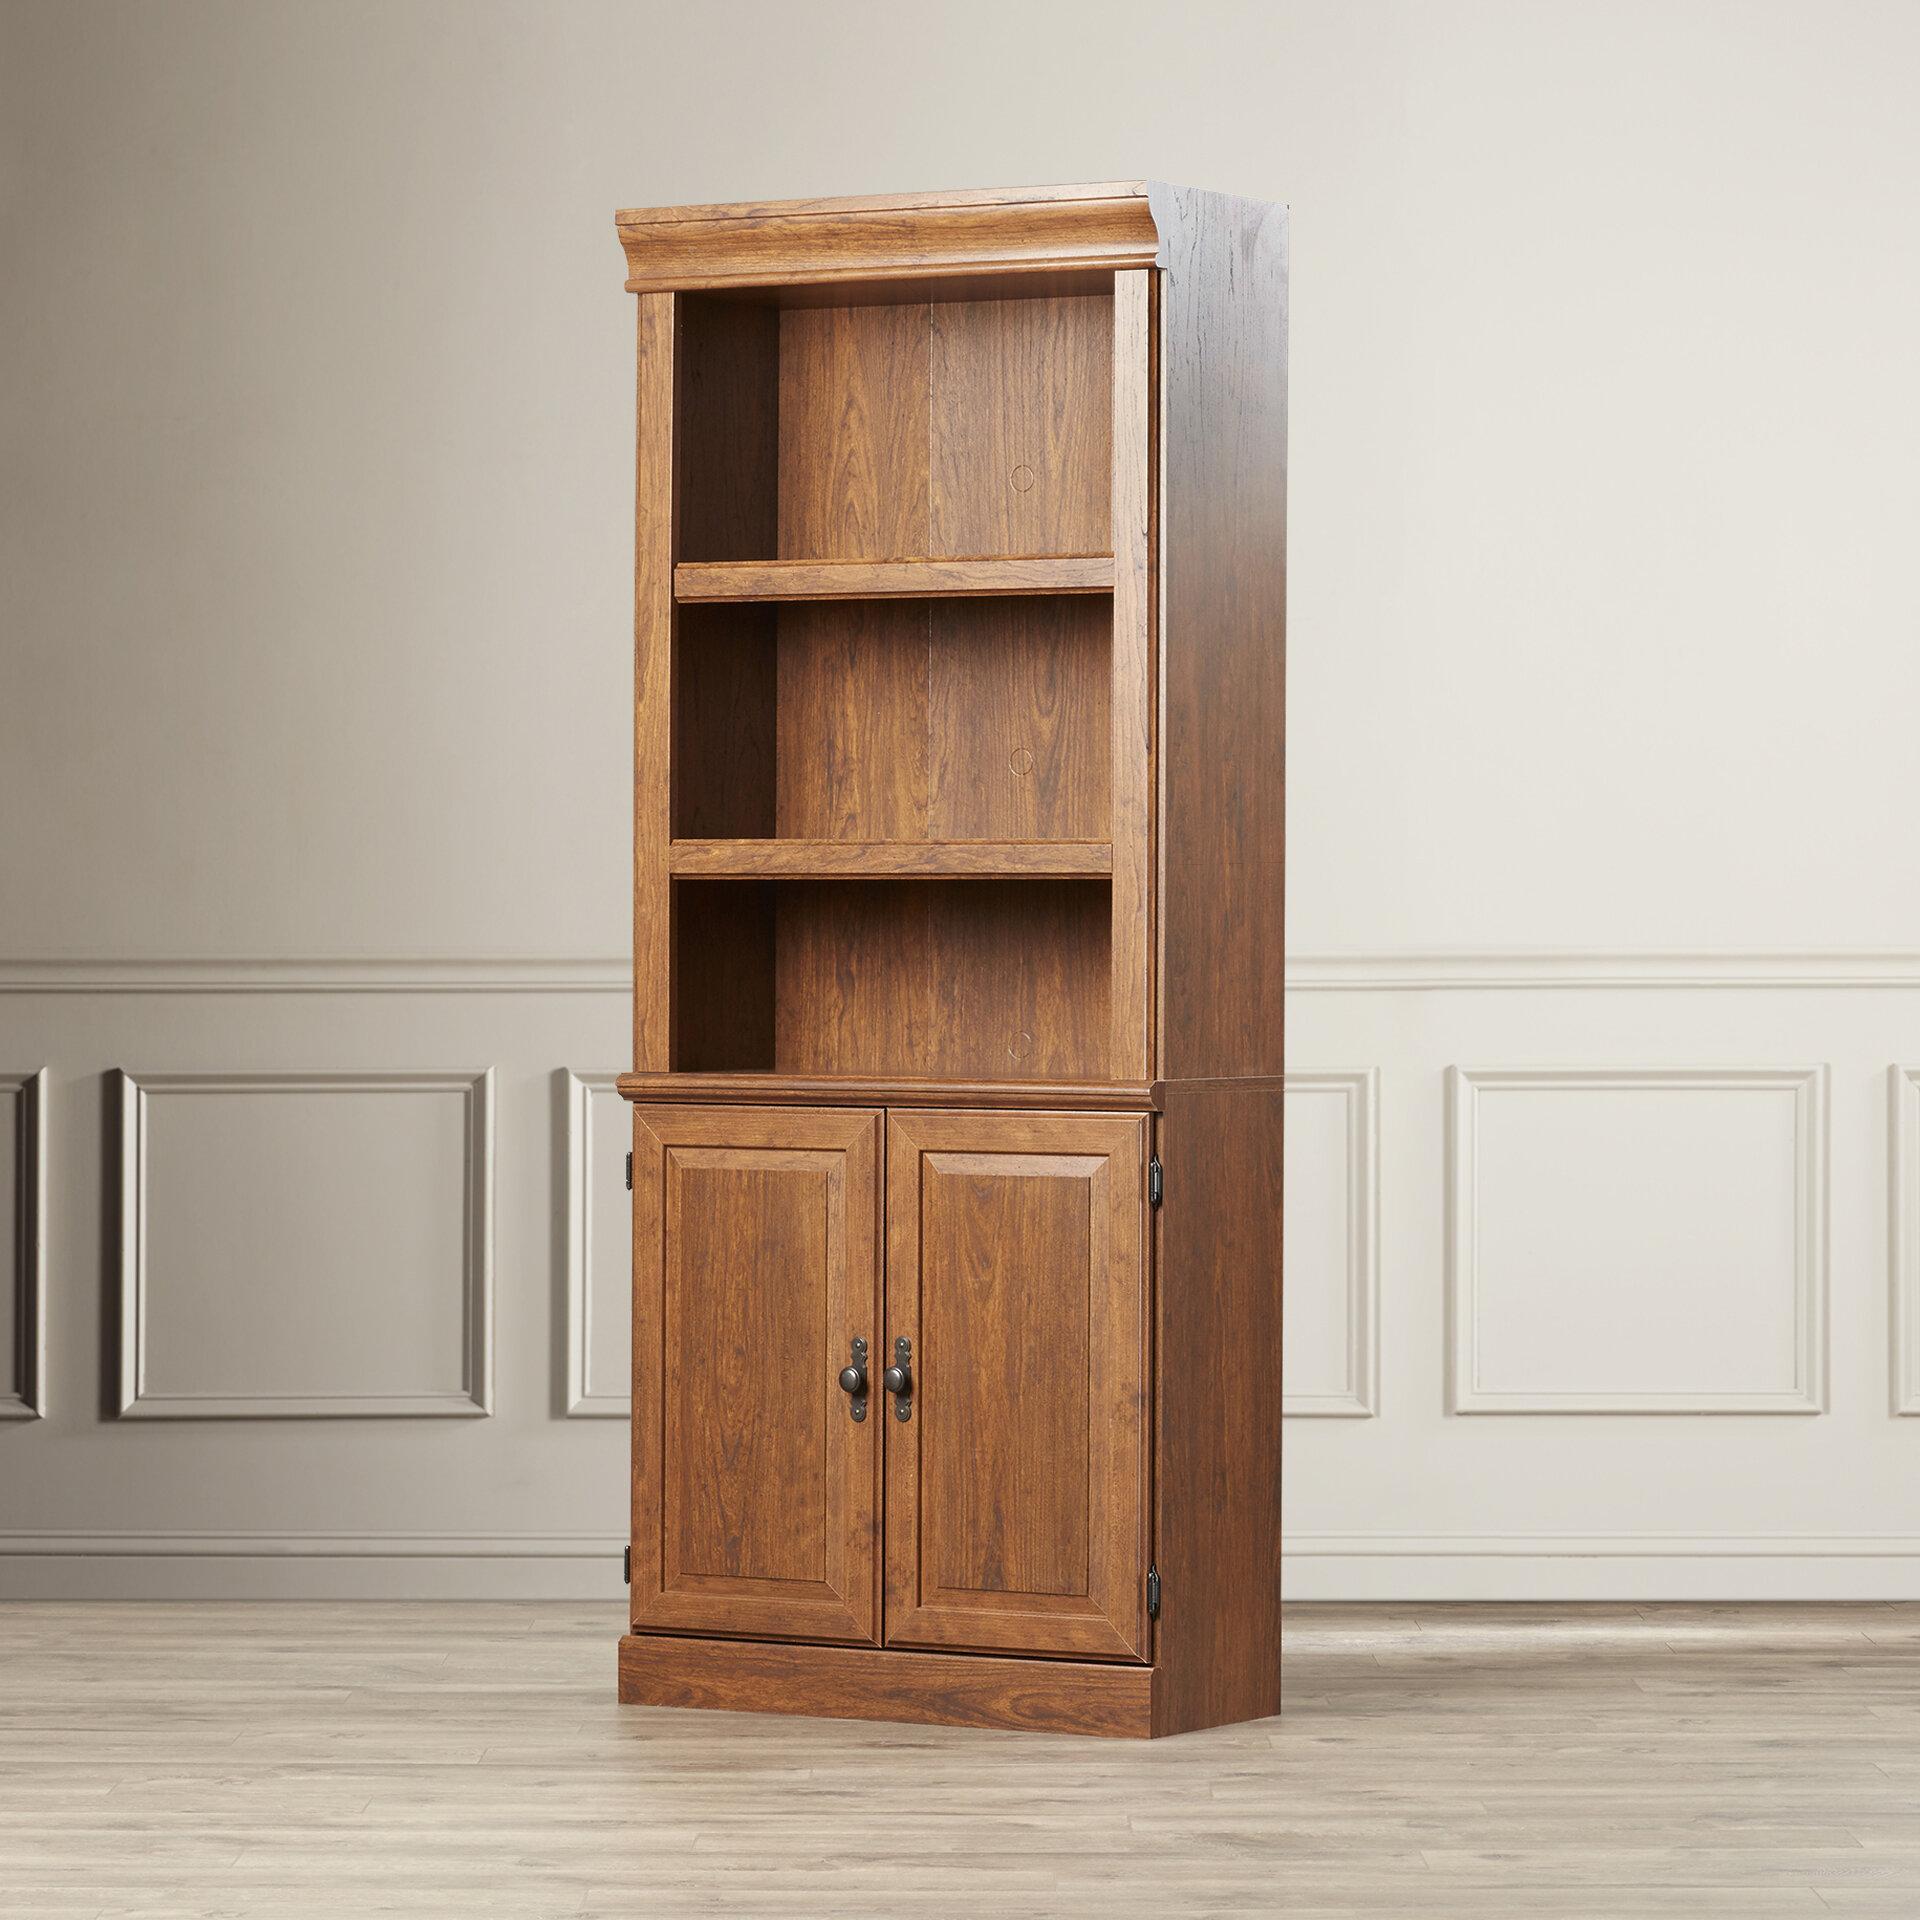 Charlton Home Oxford Standard Bookcase & Reviews | Wayfair